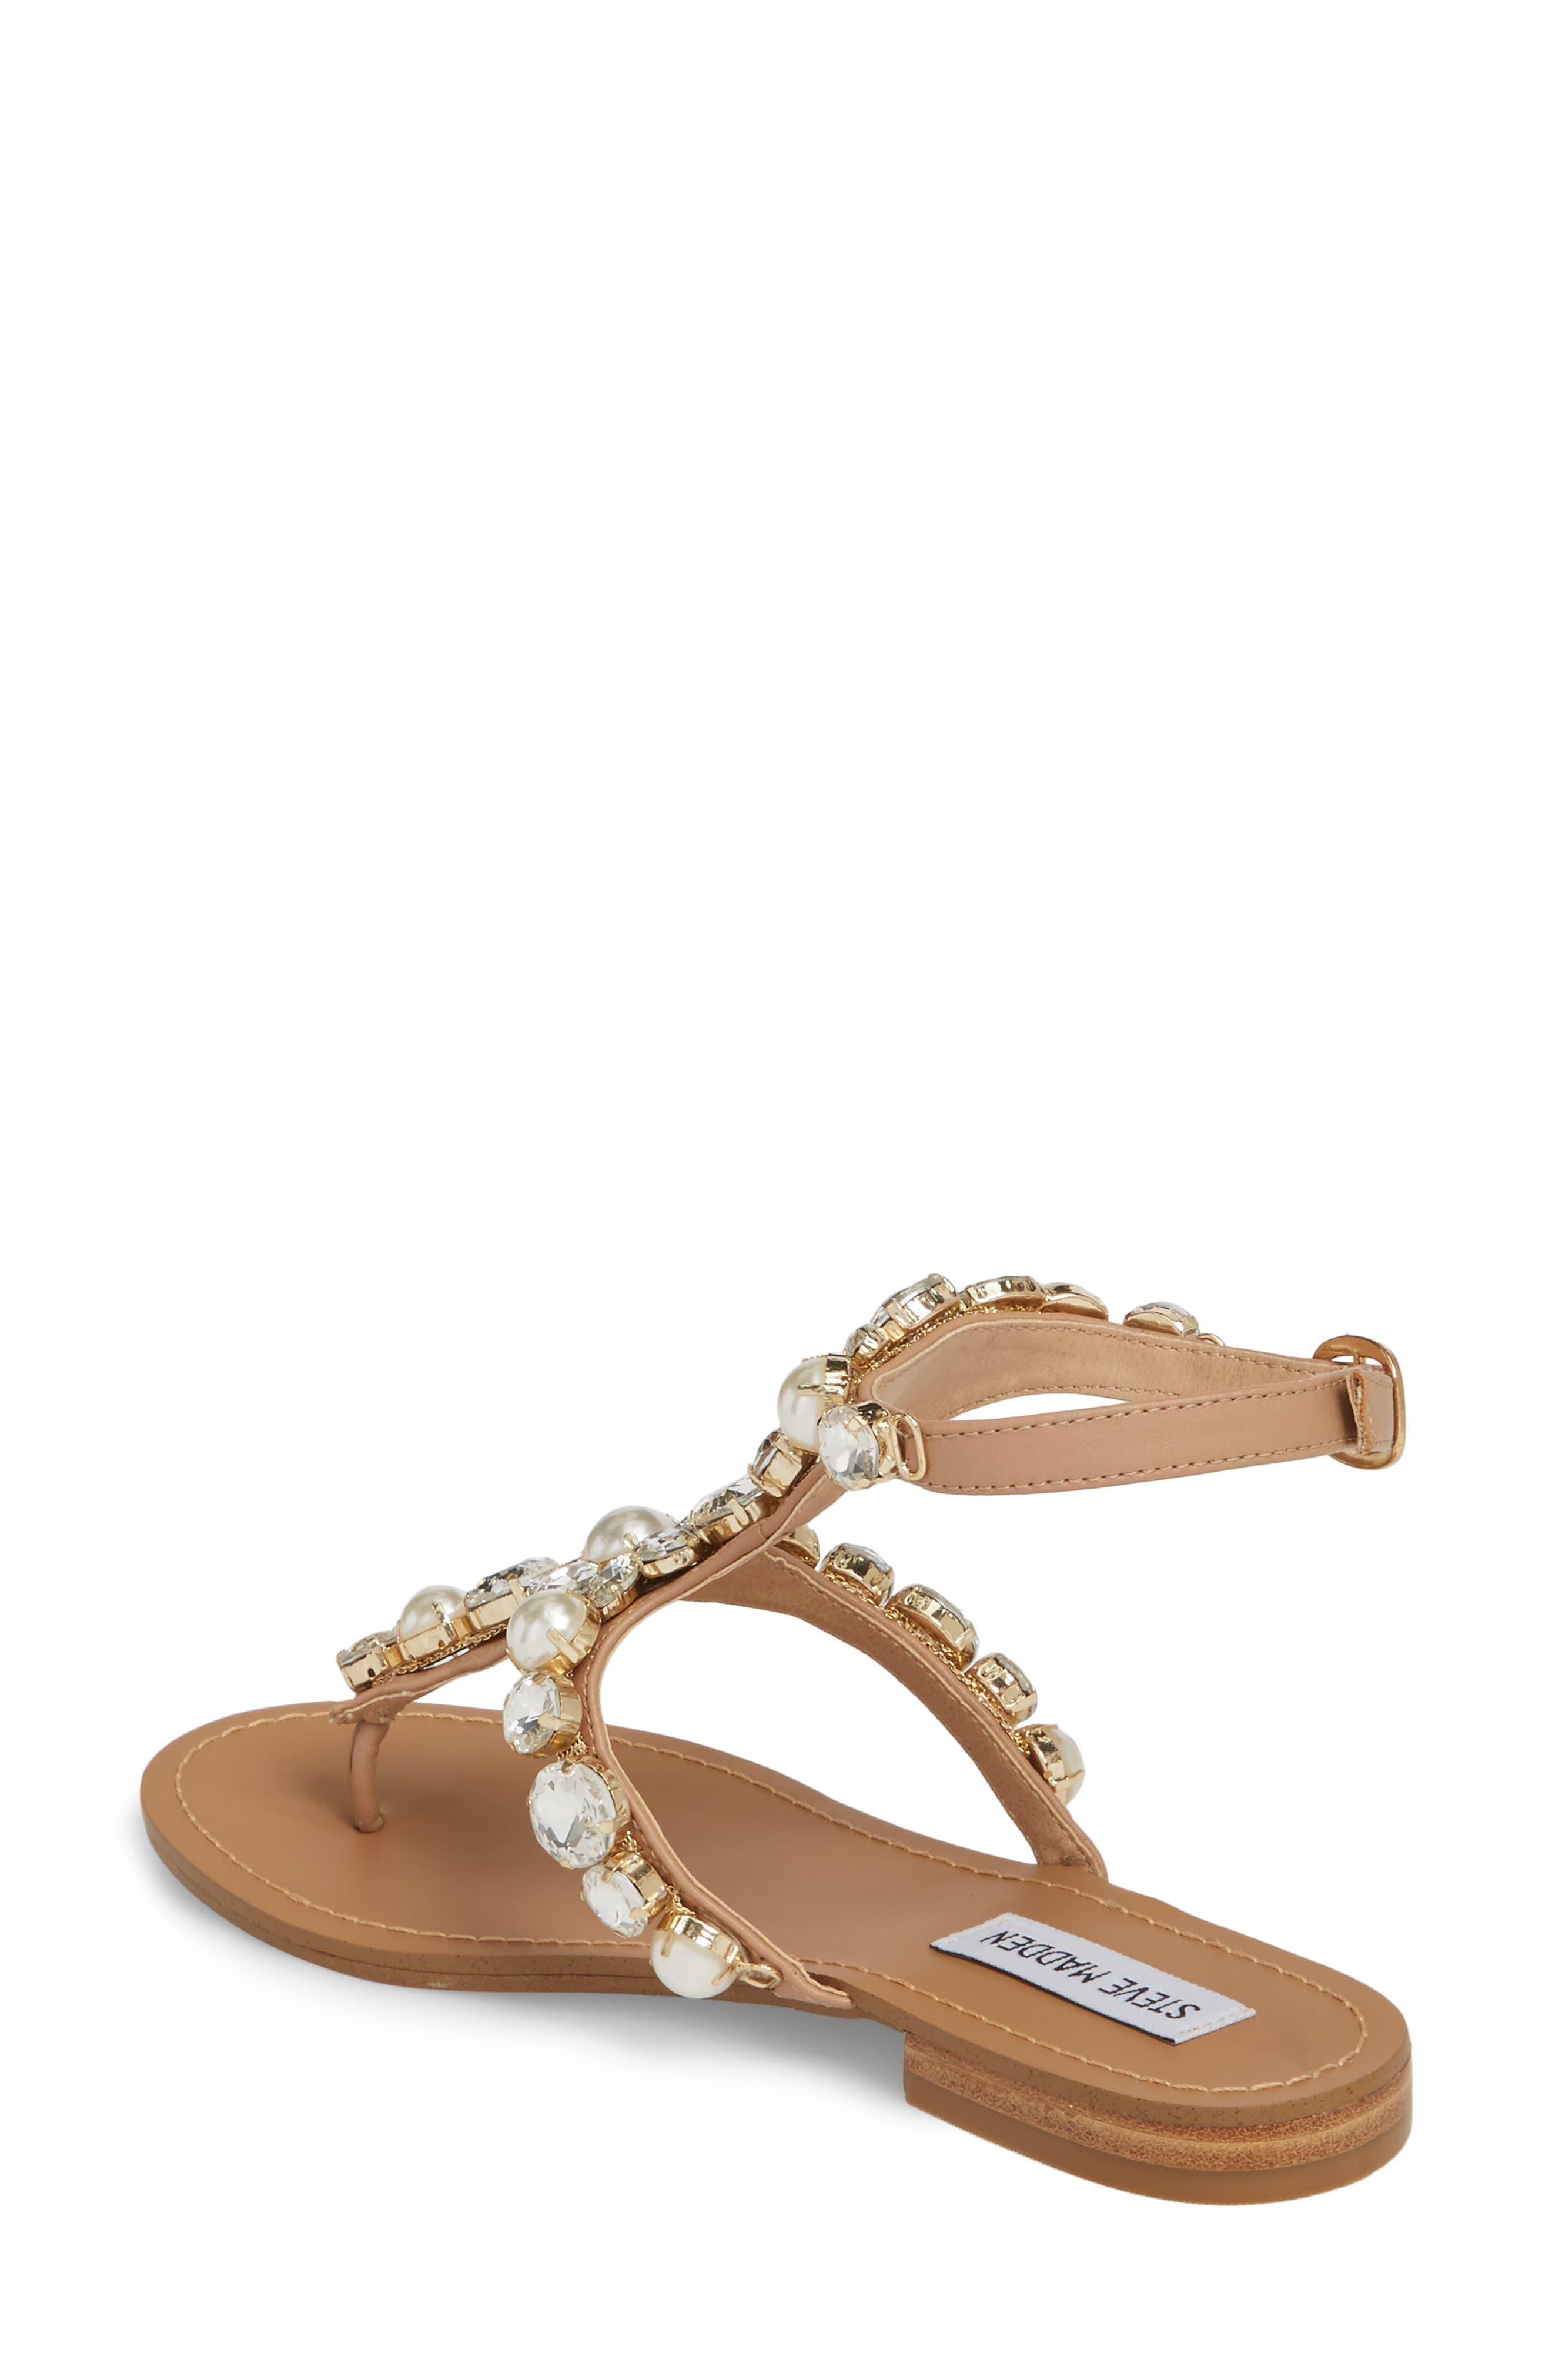 Chantel Crystal Embellished Sandal,                             Alternate thumbnail 4, color,